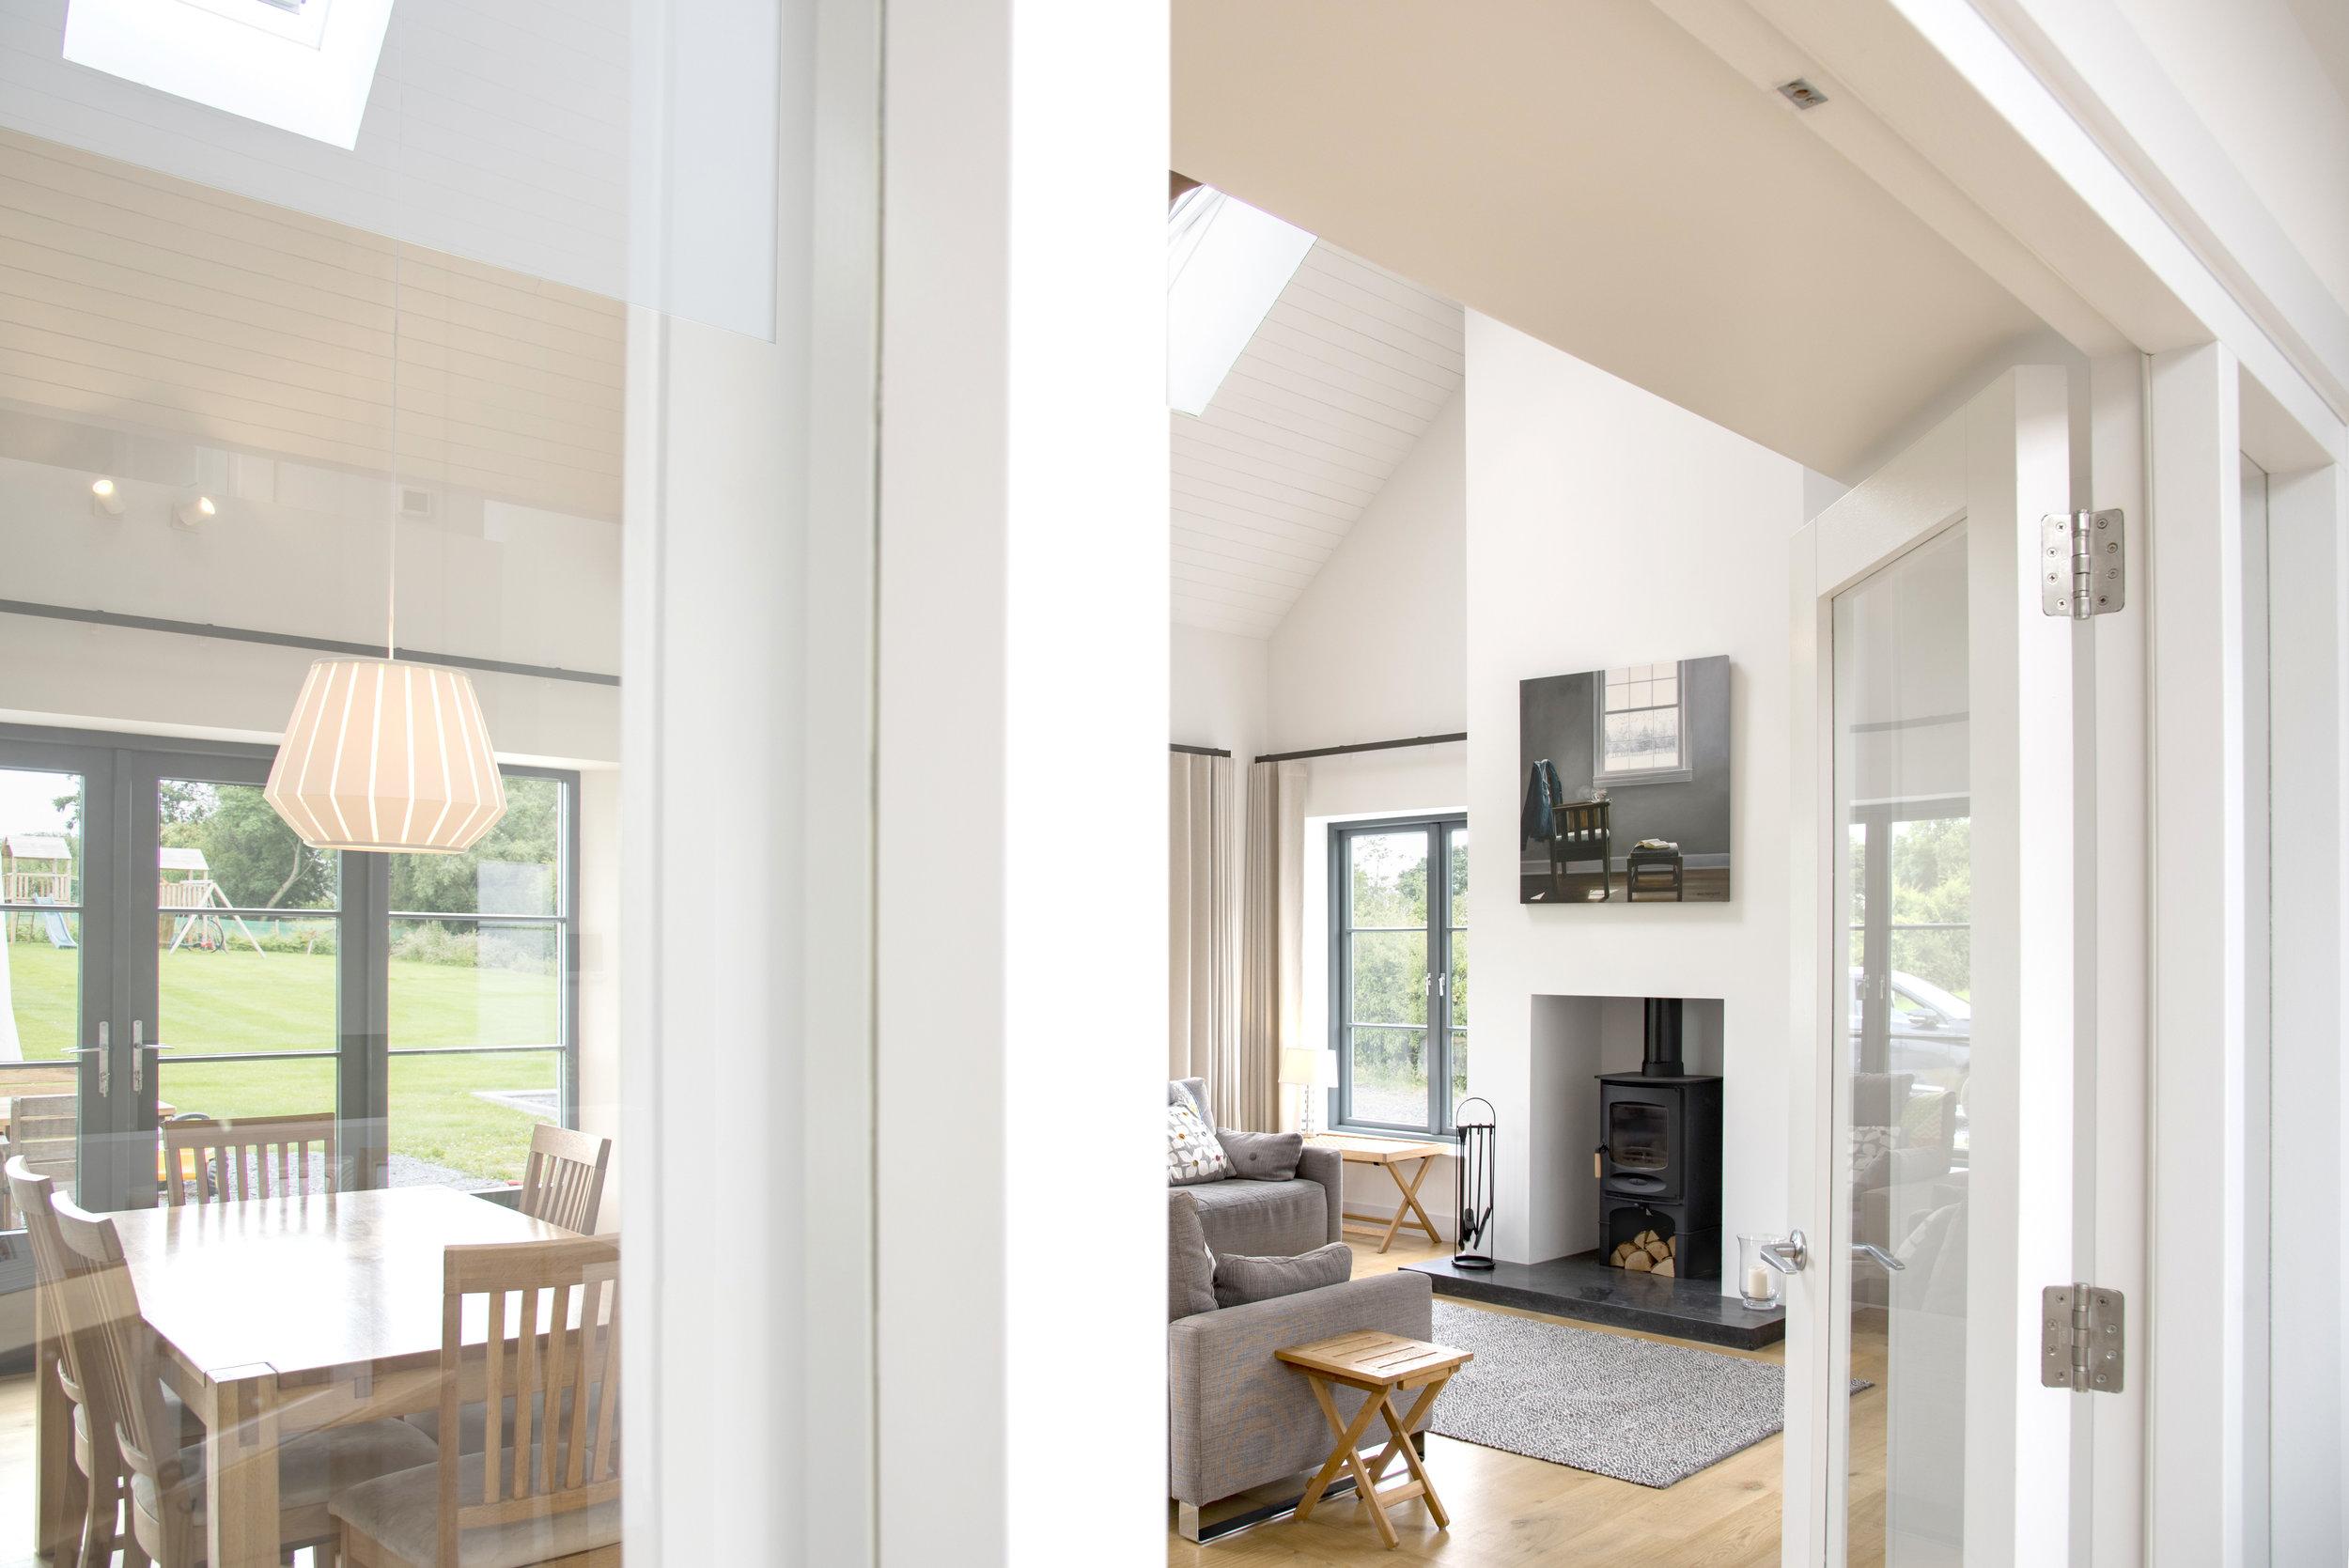 Paul_McAlister_Architects_oblique.jpg